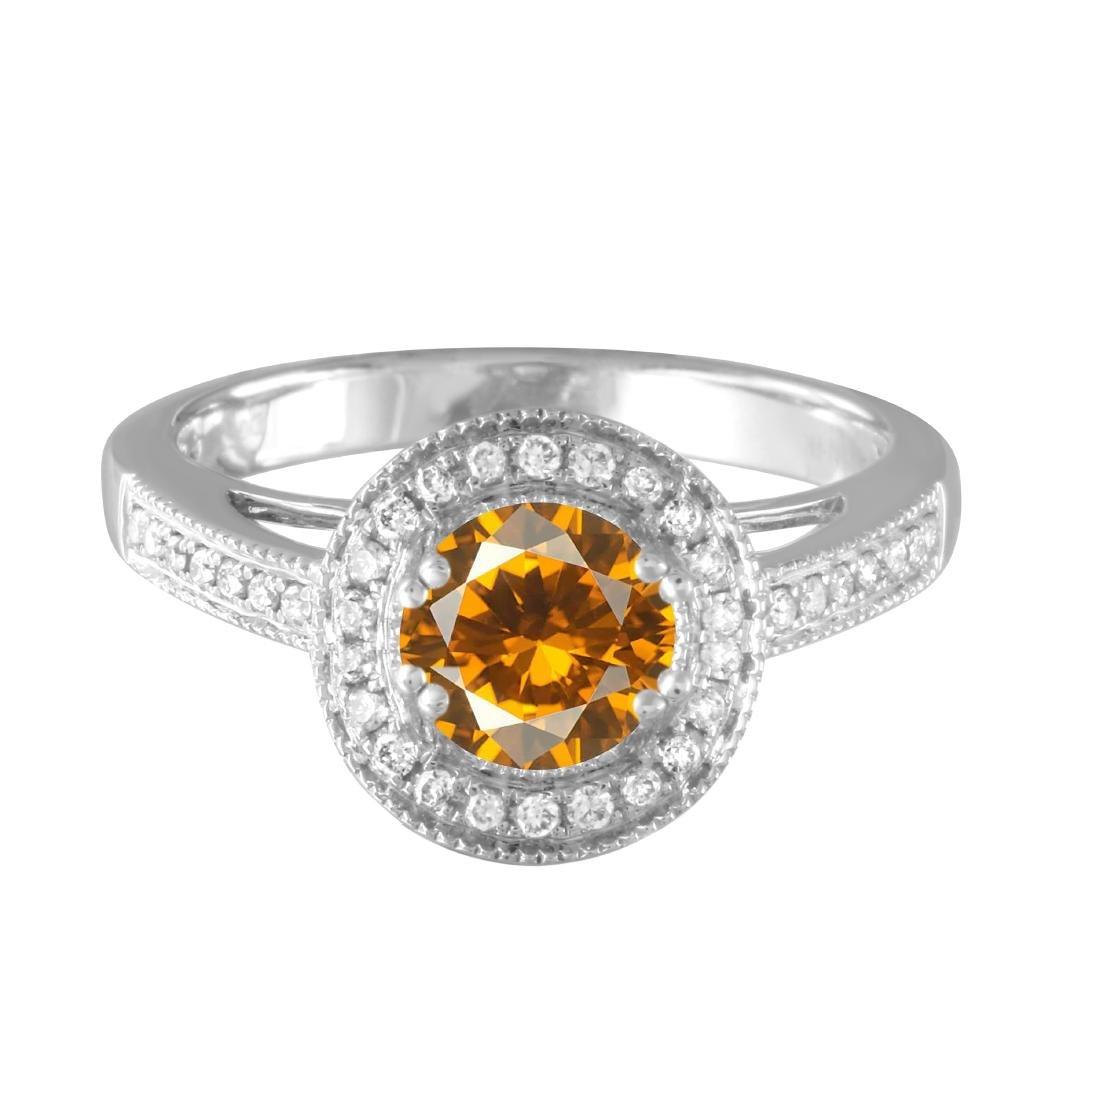 14KT White Gold 1.03ct Citrine and Diamond Ring